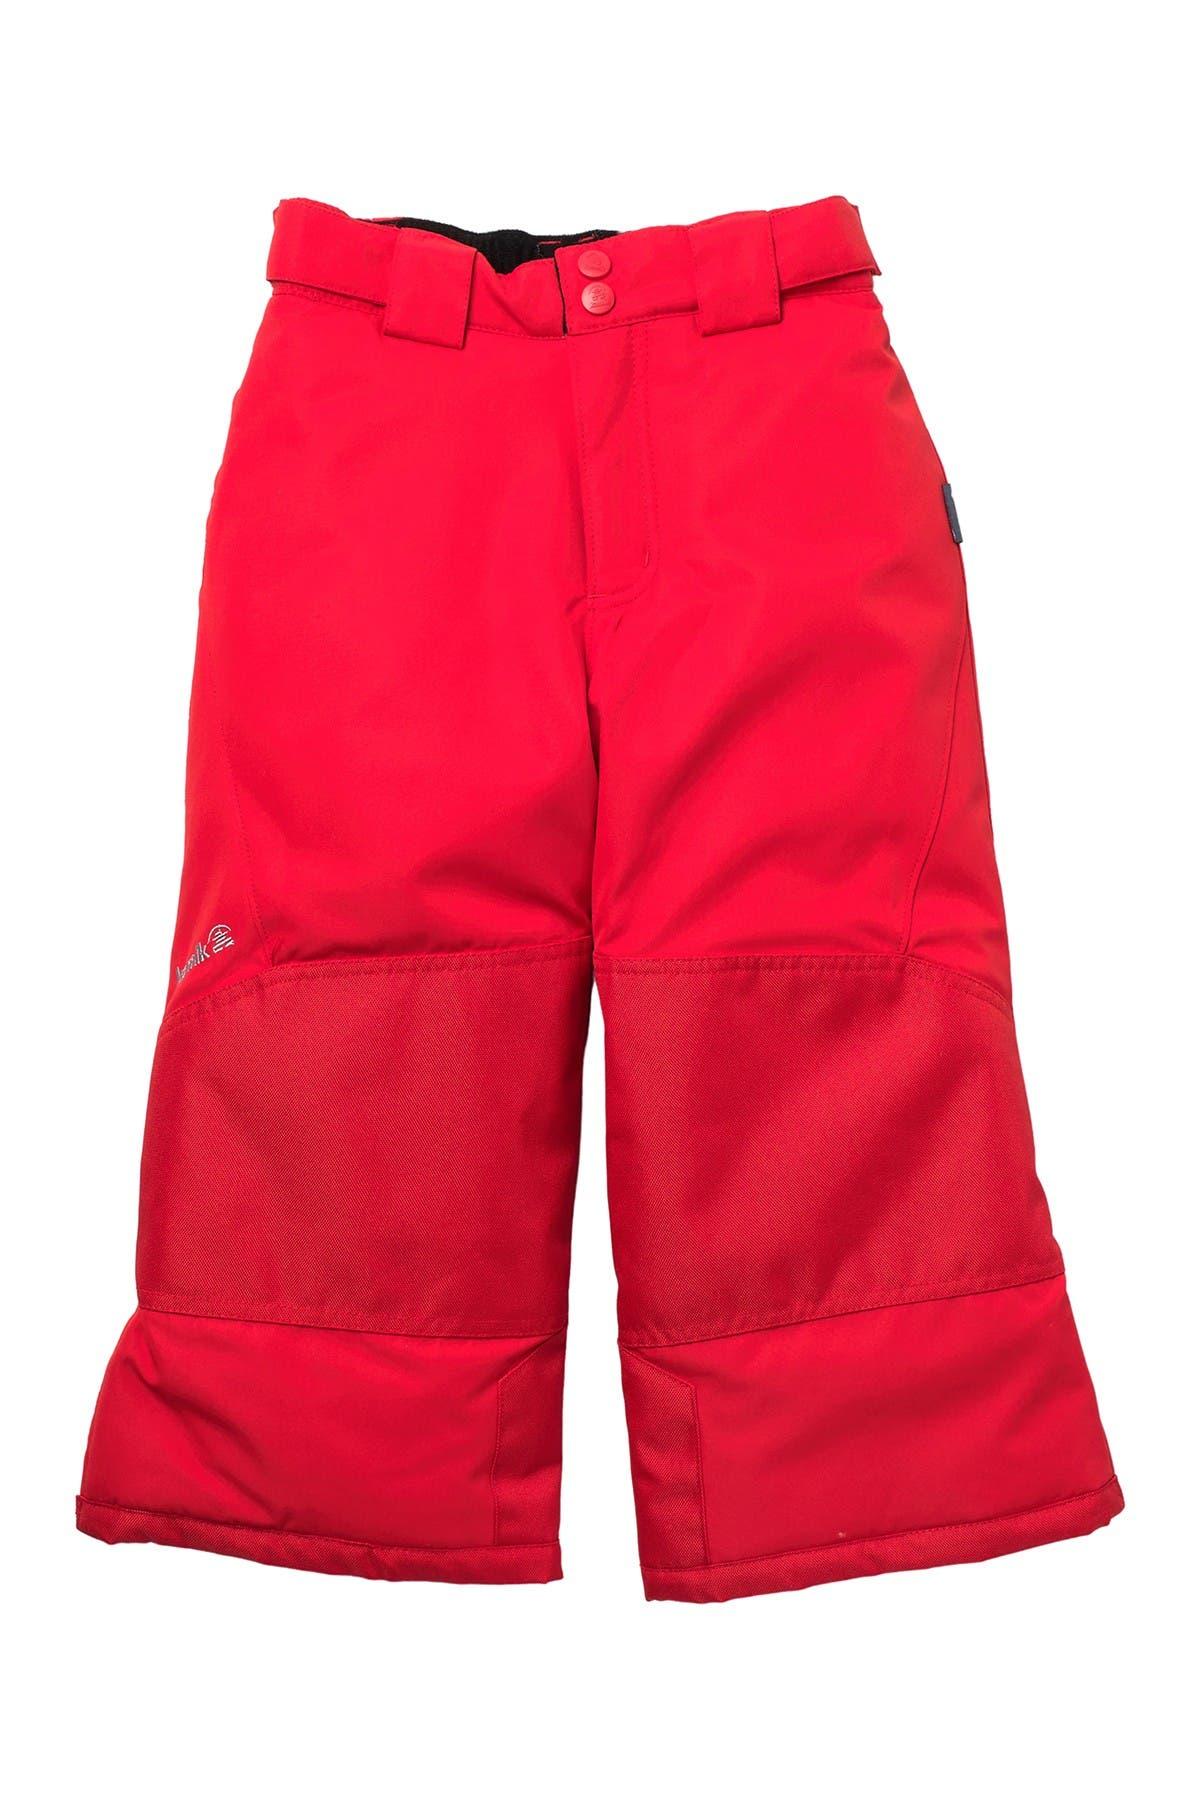 Image of Kamik Boomer Pants